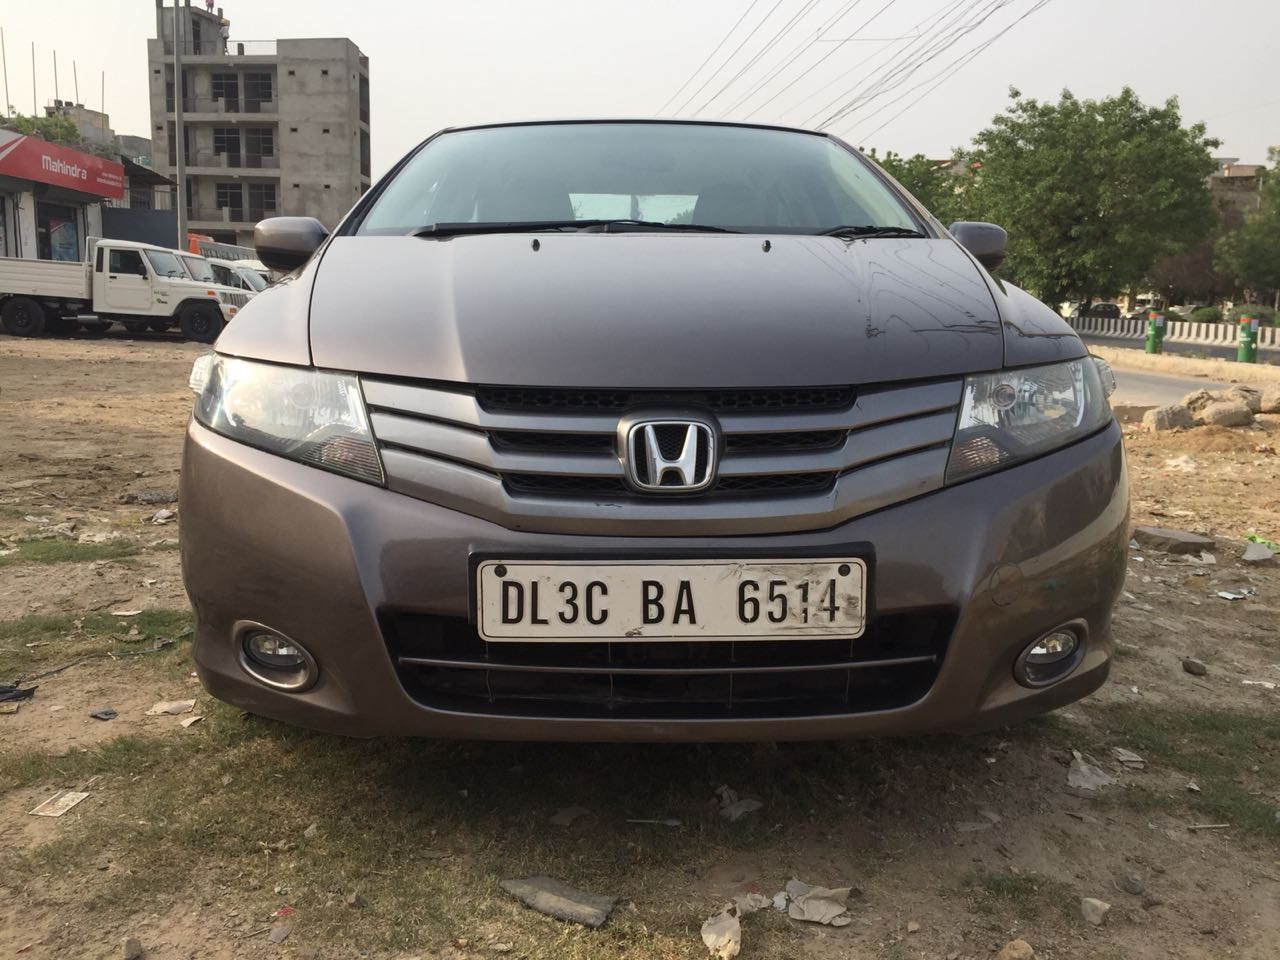 Secondhand Honda City-VMT car in Dwarka and Uttam Nagar